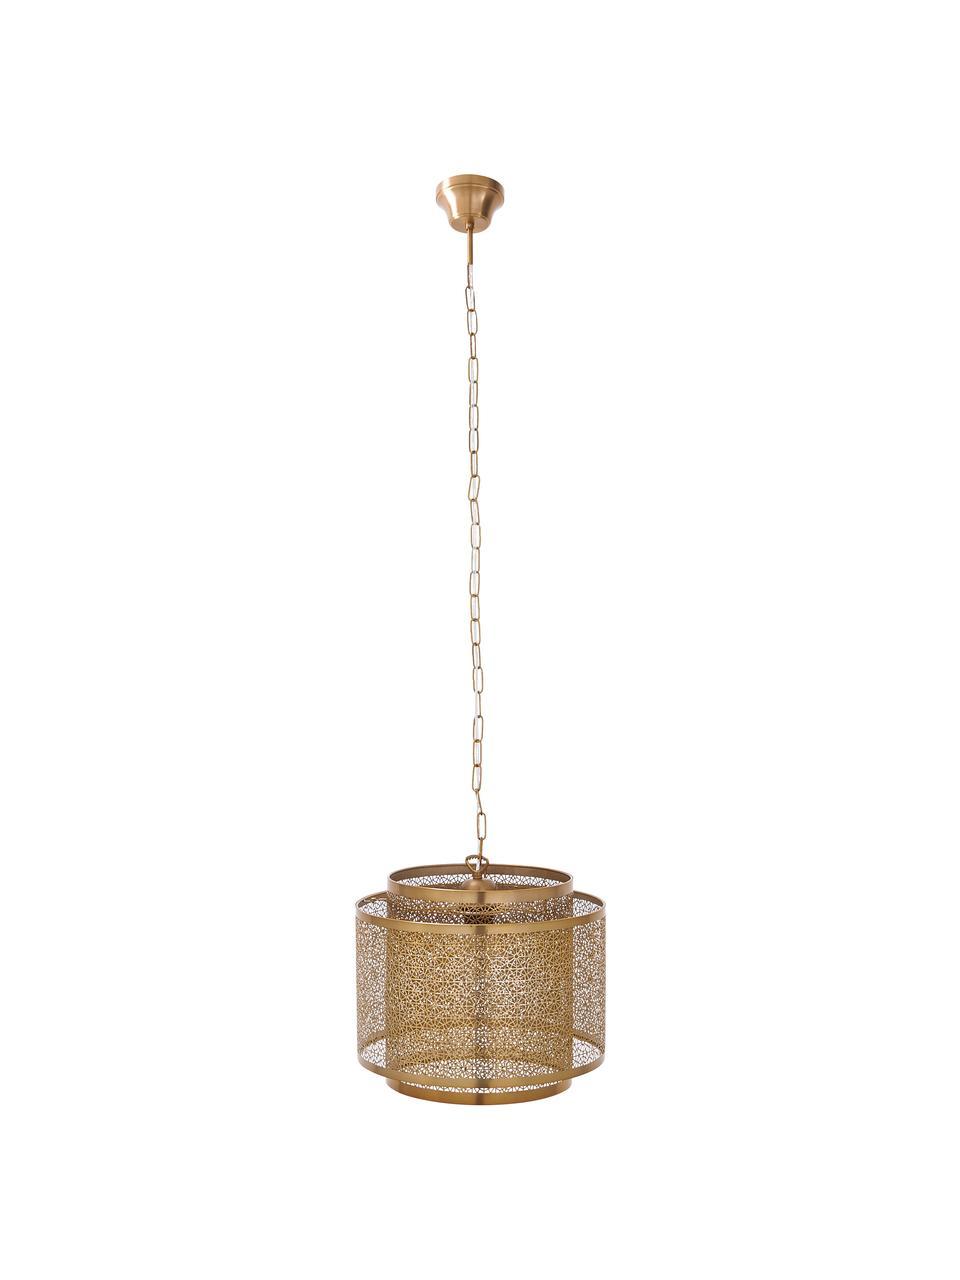 Boho hanglamp Hermine van metaal, Messing, Mat messingkleurig, Ø 35  x H 28 cm